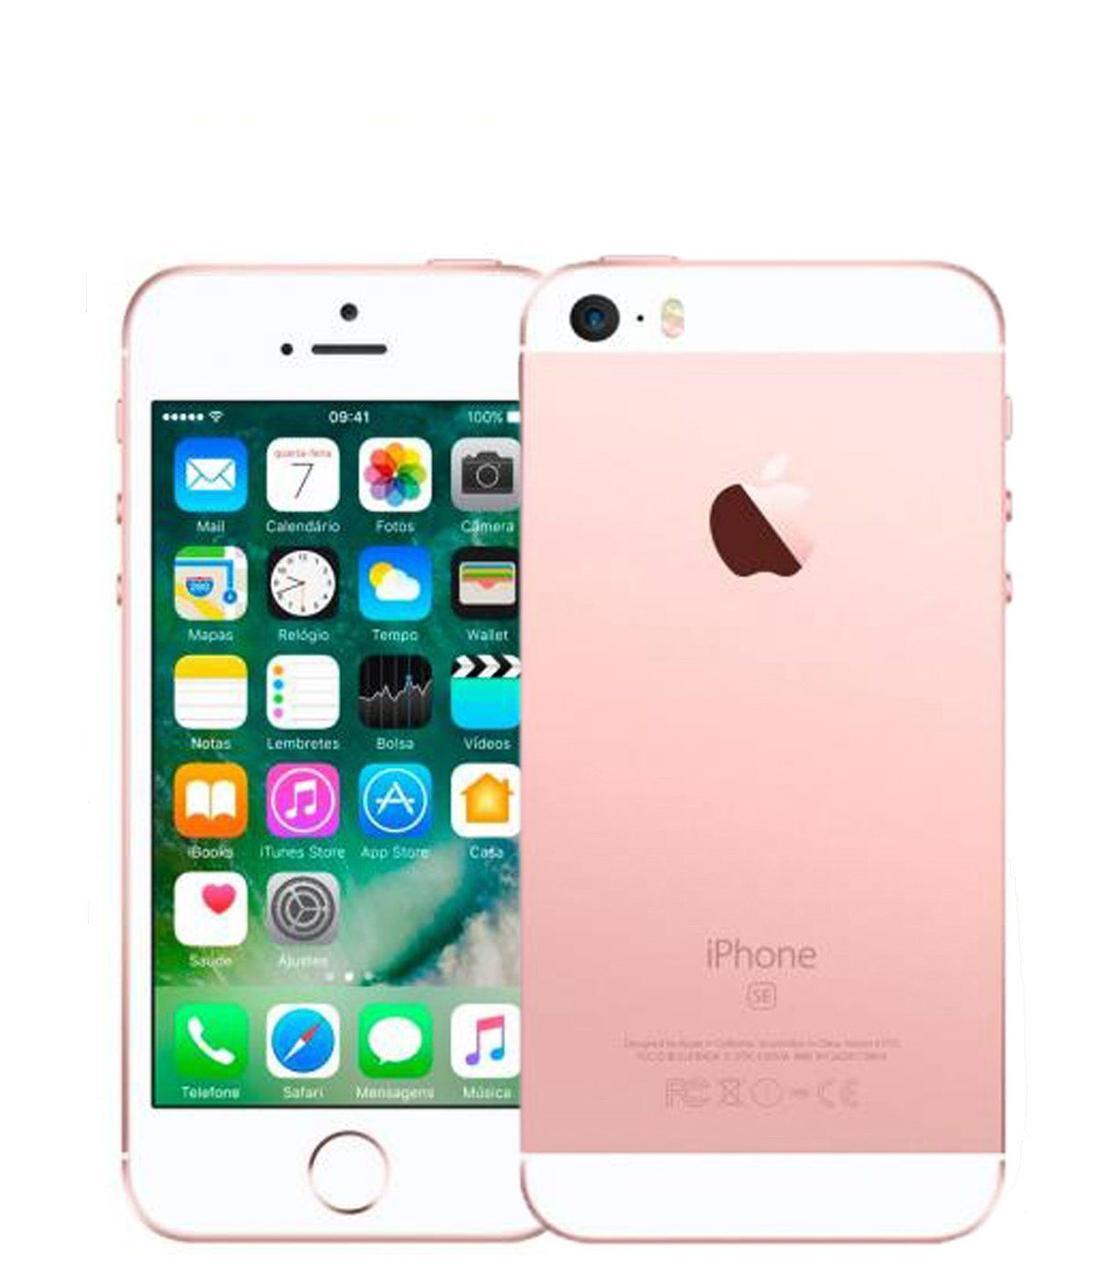 Apple iPhone SE 32Gb Rose Gold (MP852)